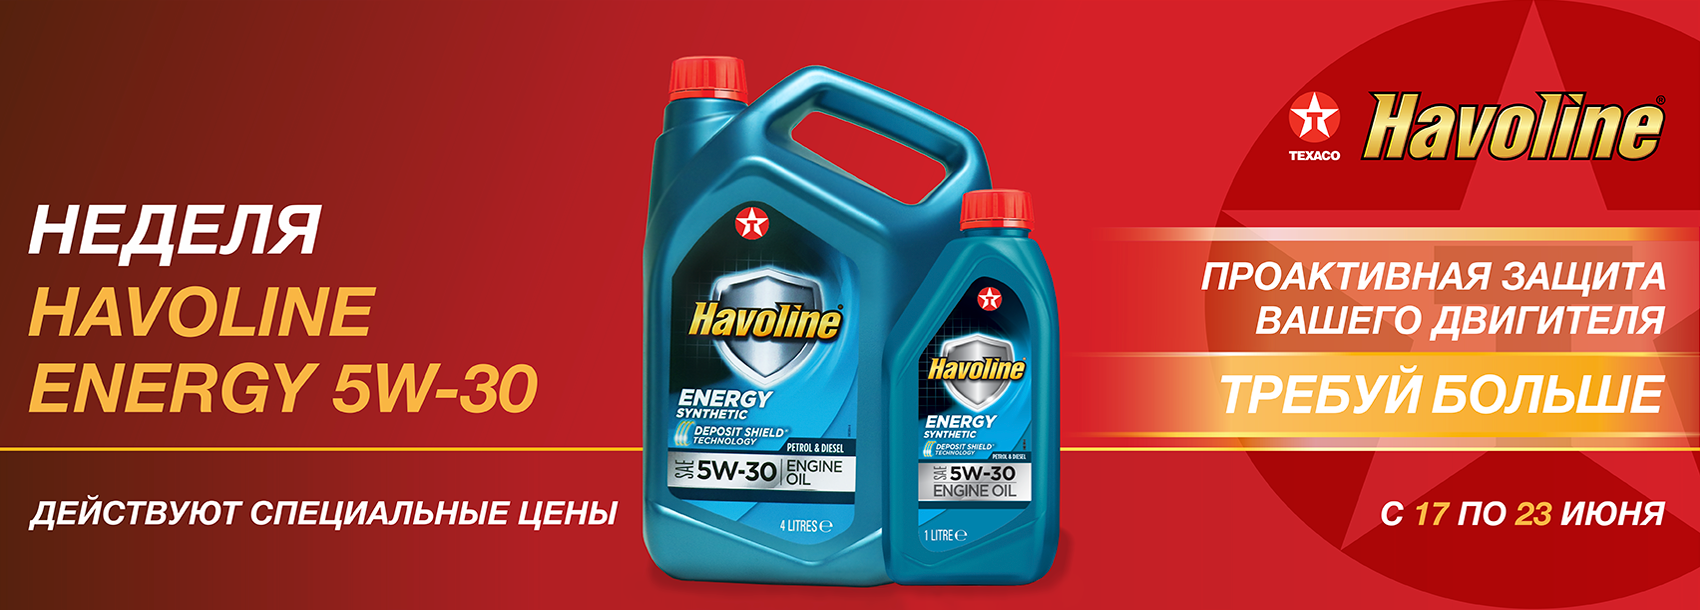 Выгодные 'Недели с Texaco Havoline': Havoline Energy 5W-30